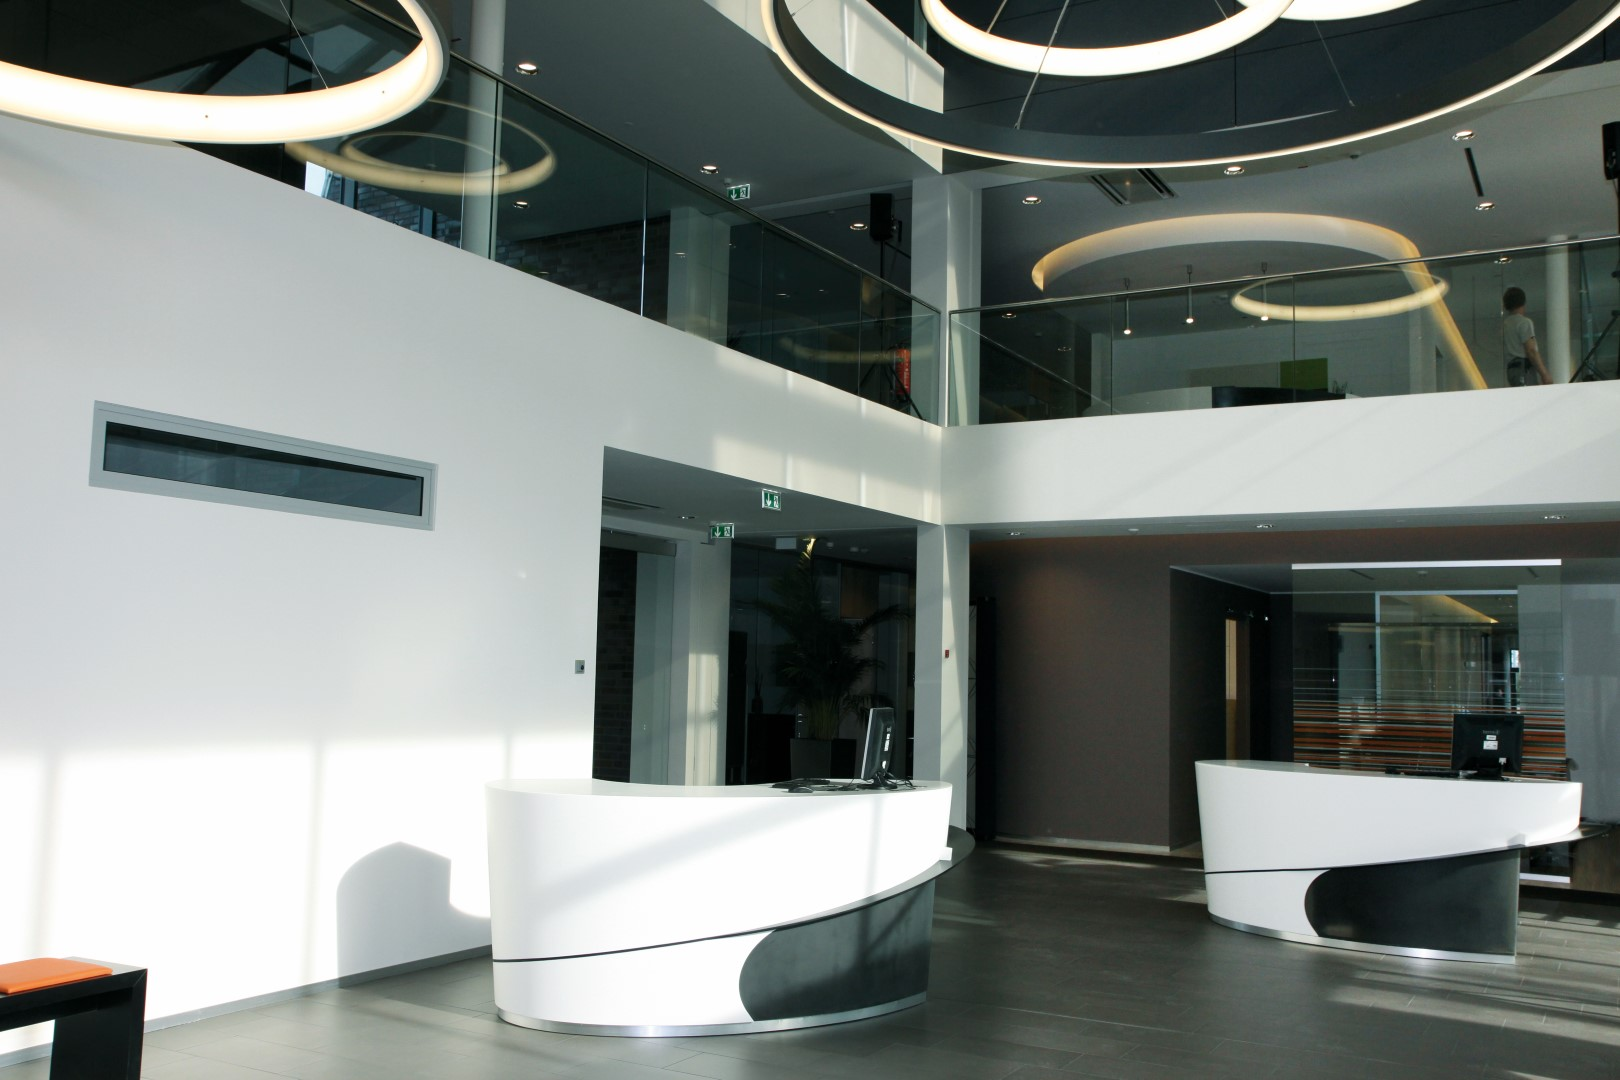 Fotos de VR Bank Nord eG - Filiale Niebüll